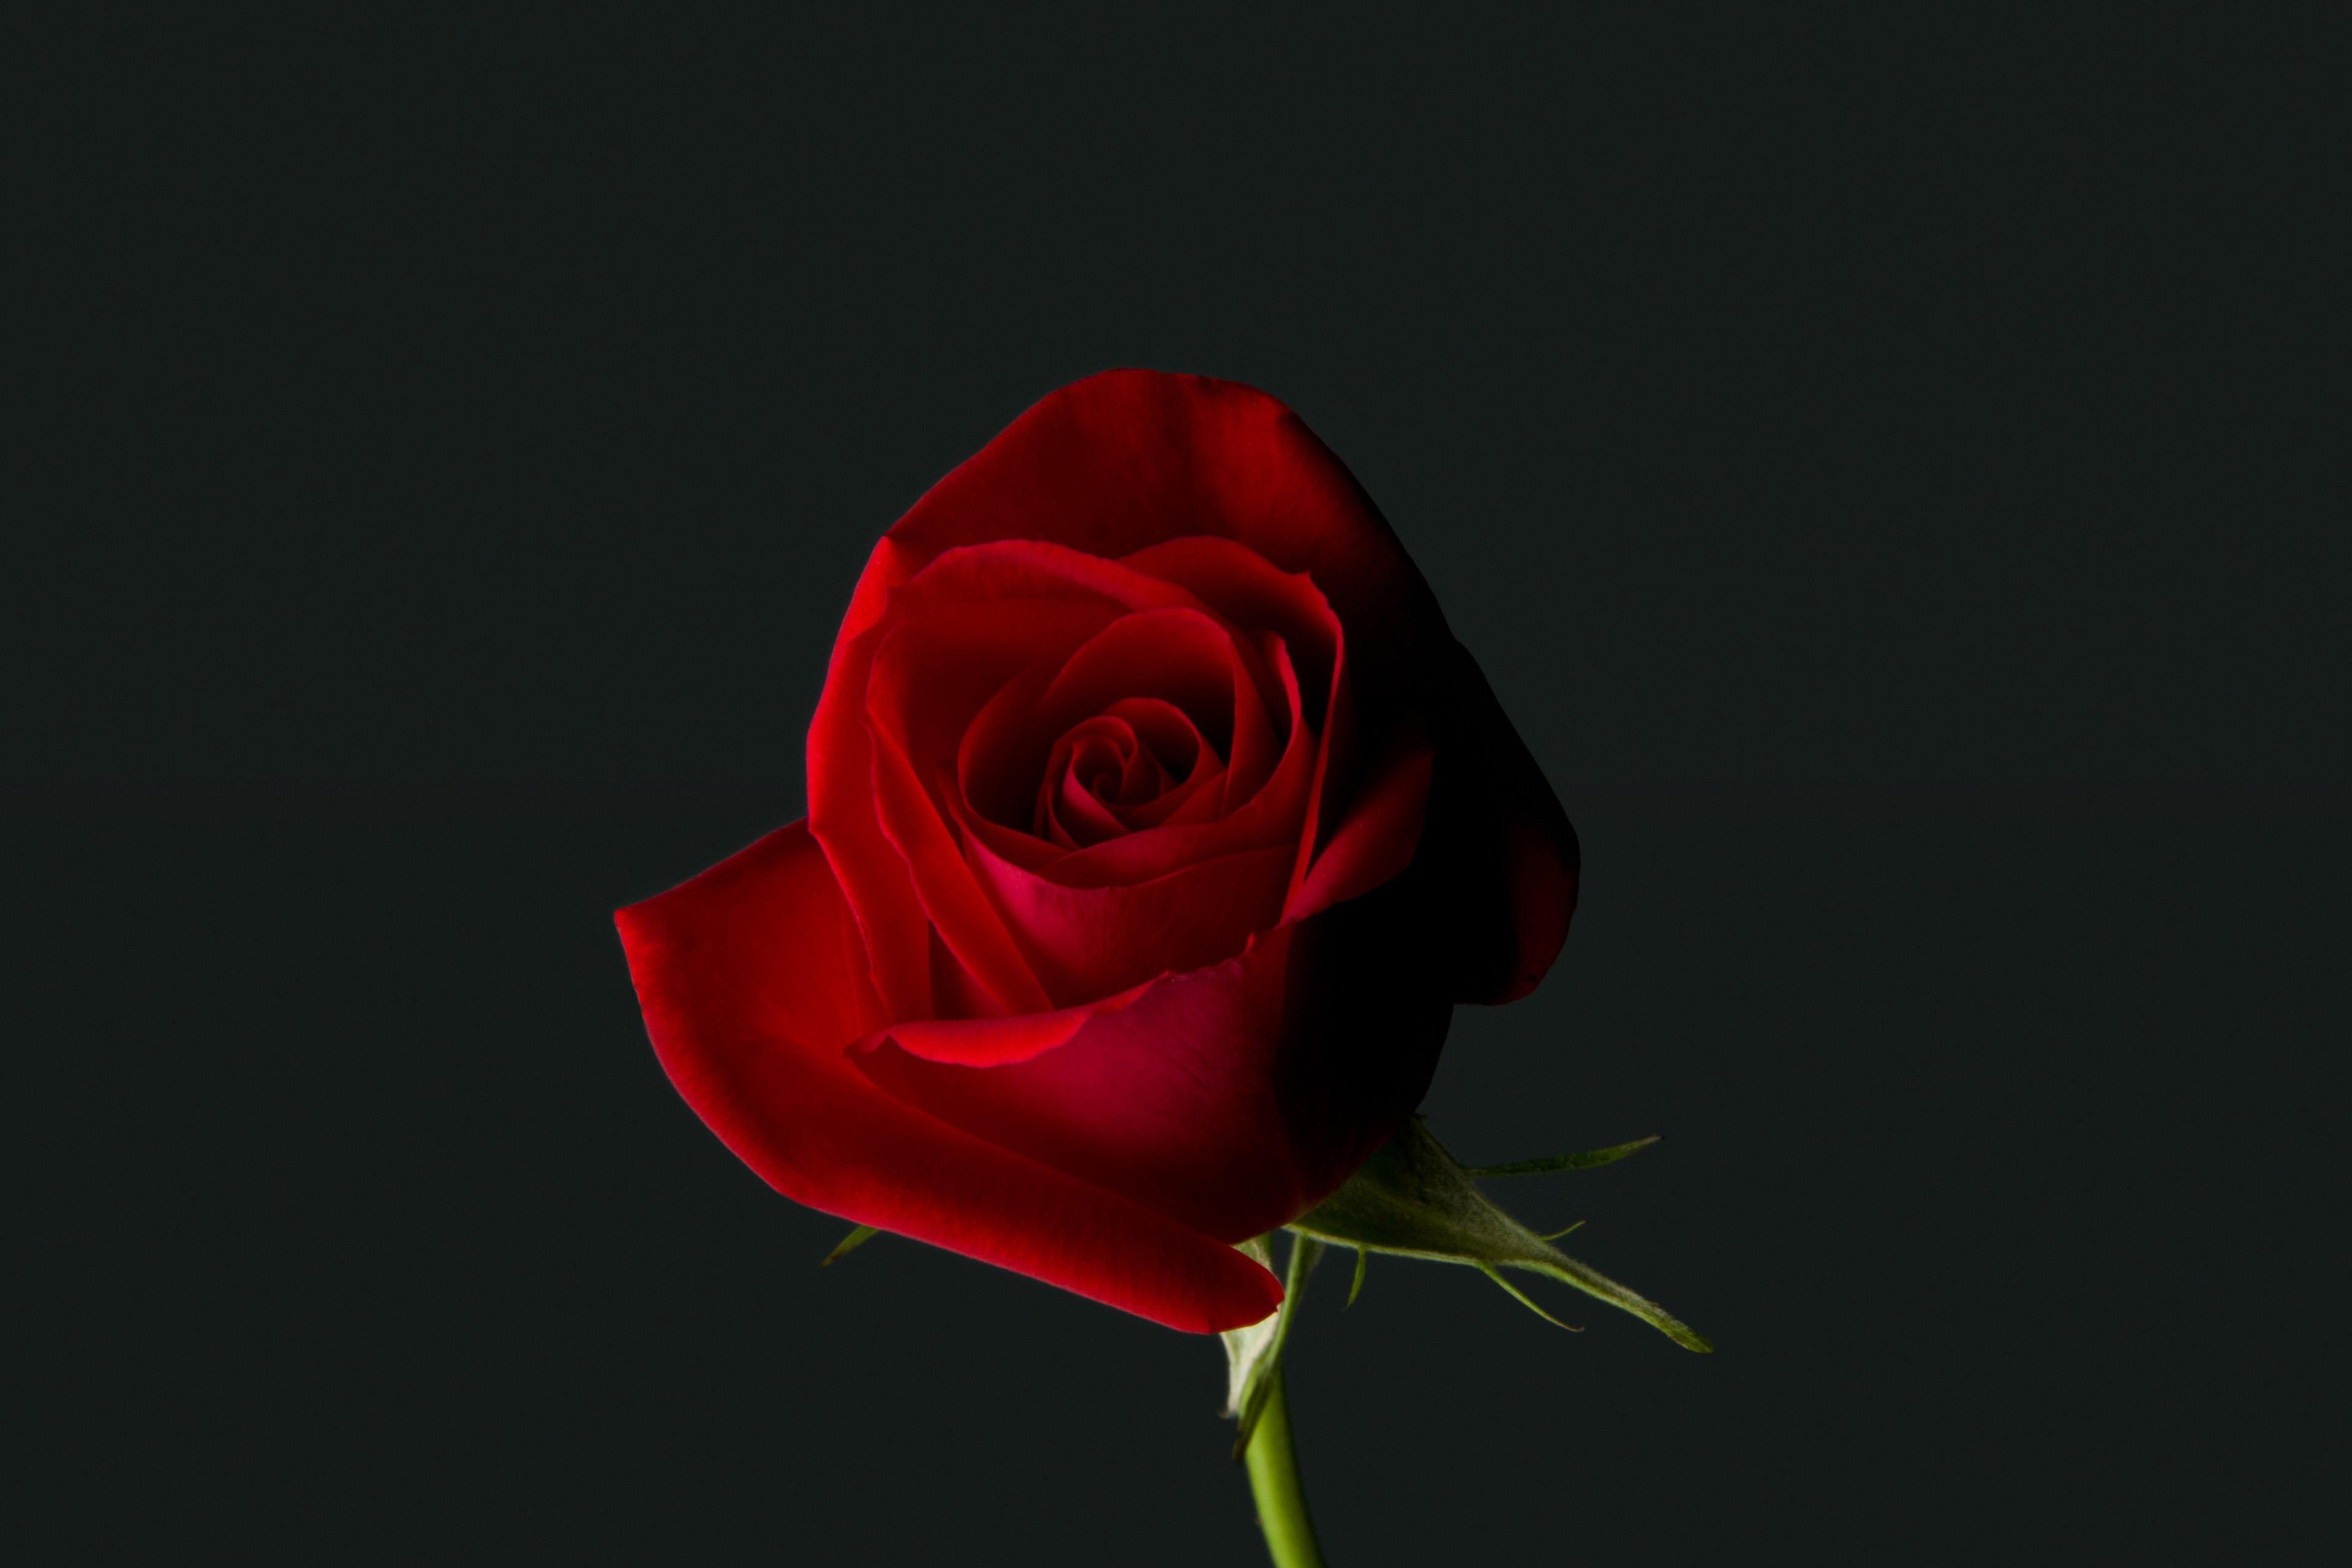 Rose Red Flower 4K Wallpaper - Best Wallpapers